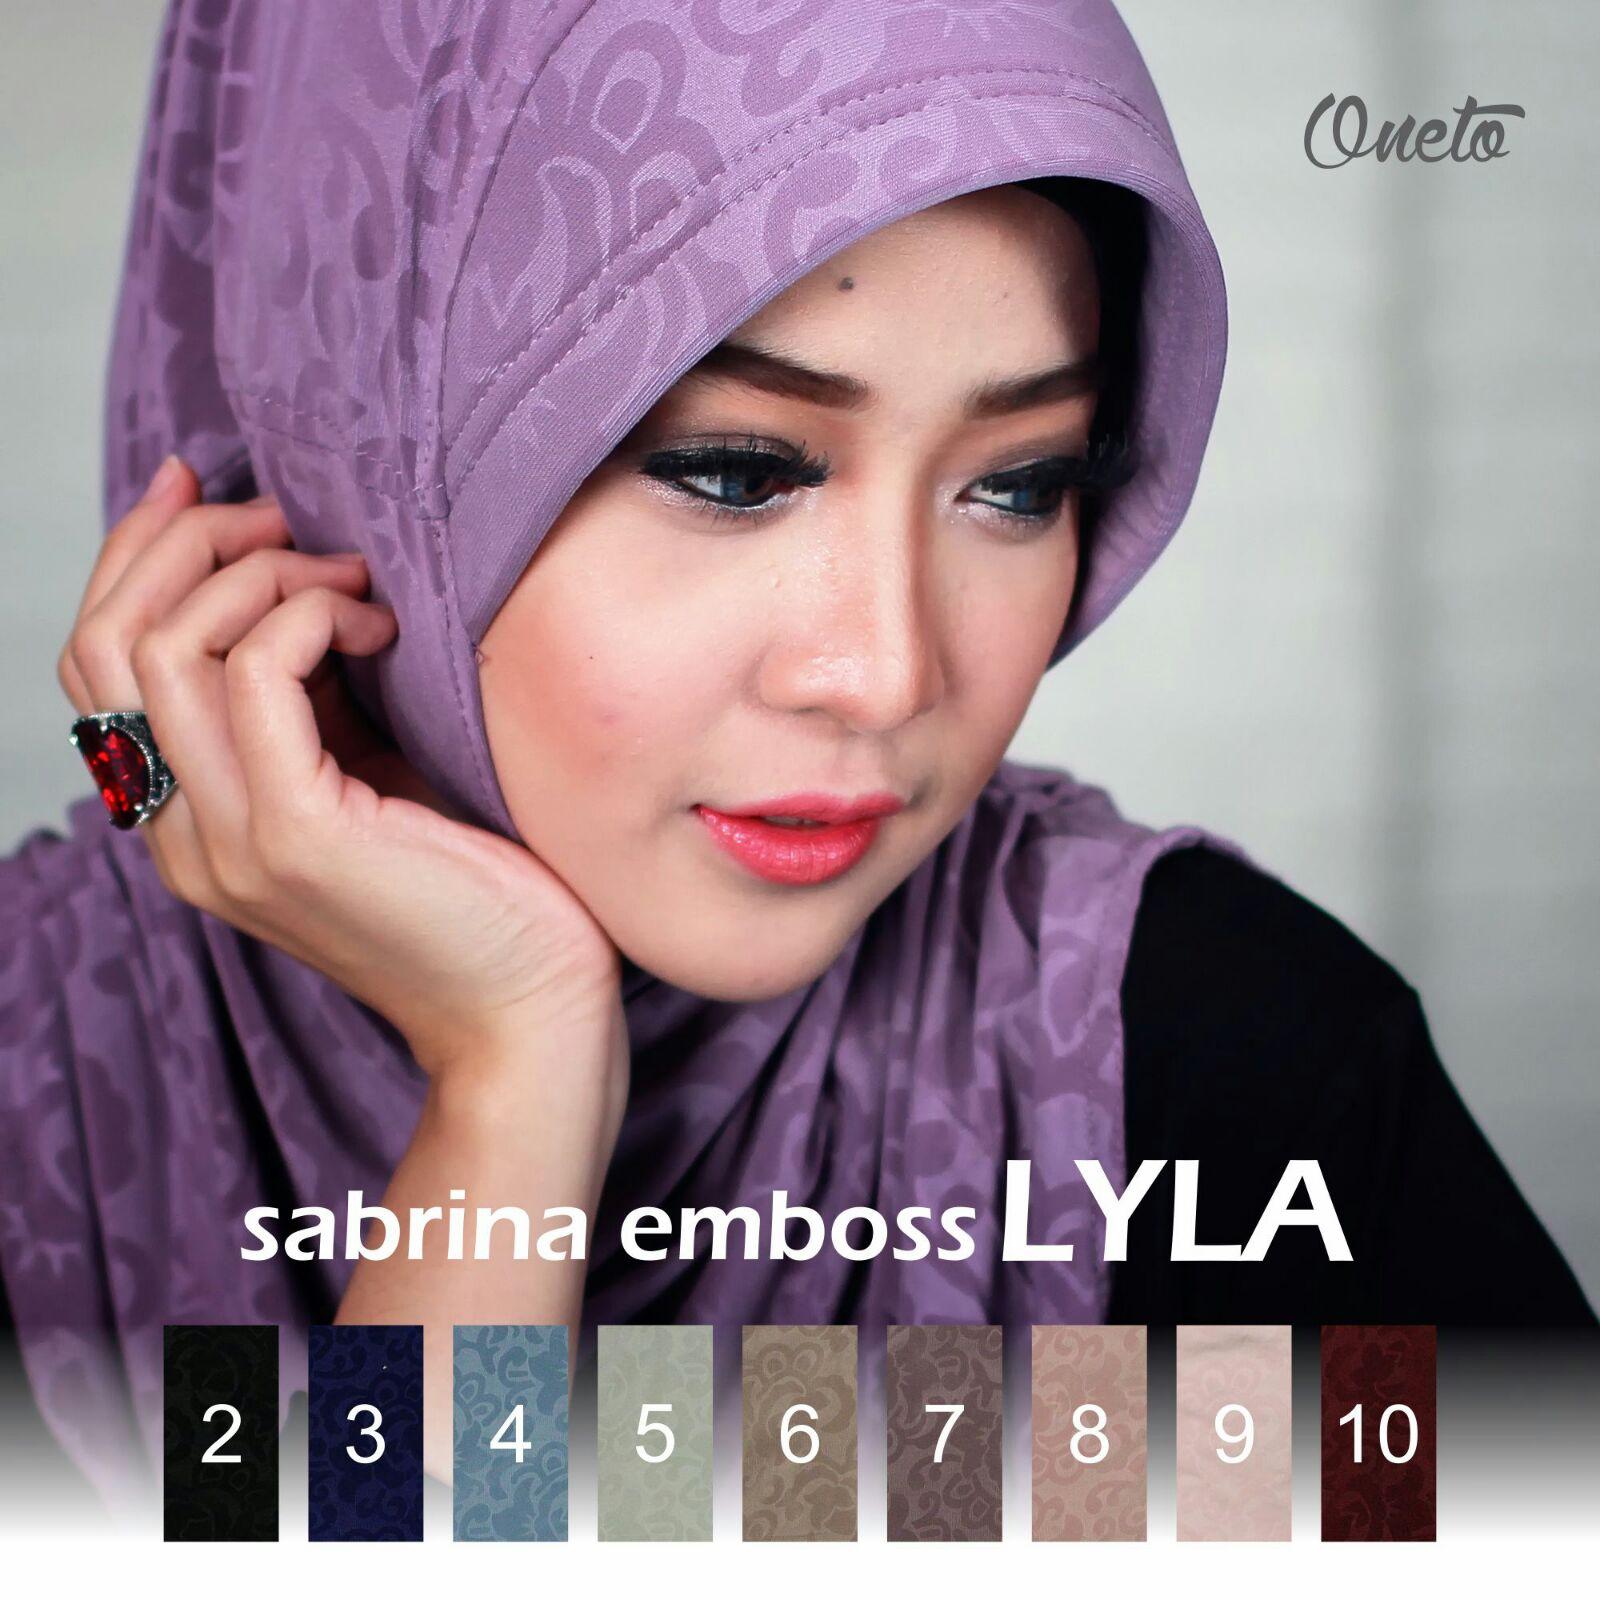 Hijab Instan Jilbab Instan Khimar Syari Triangle Bolak Balik Source · Jilbab Instan Khimar Tri Layer Shopee Indonesia Source JILBAB ONETO SABRINA EMBOS